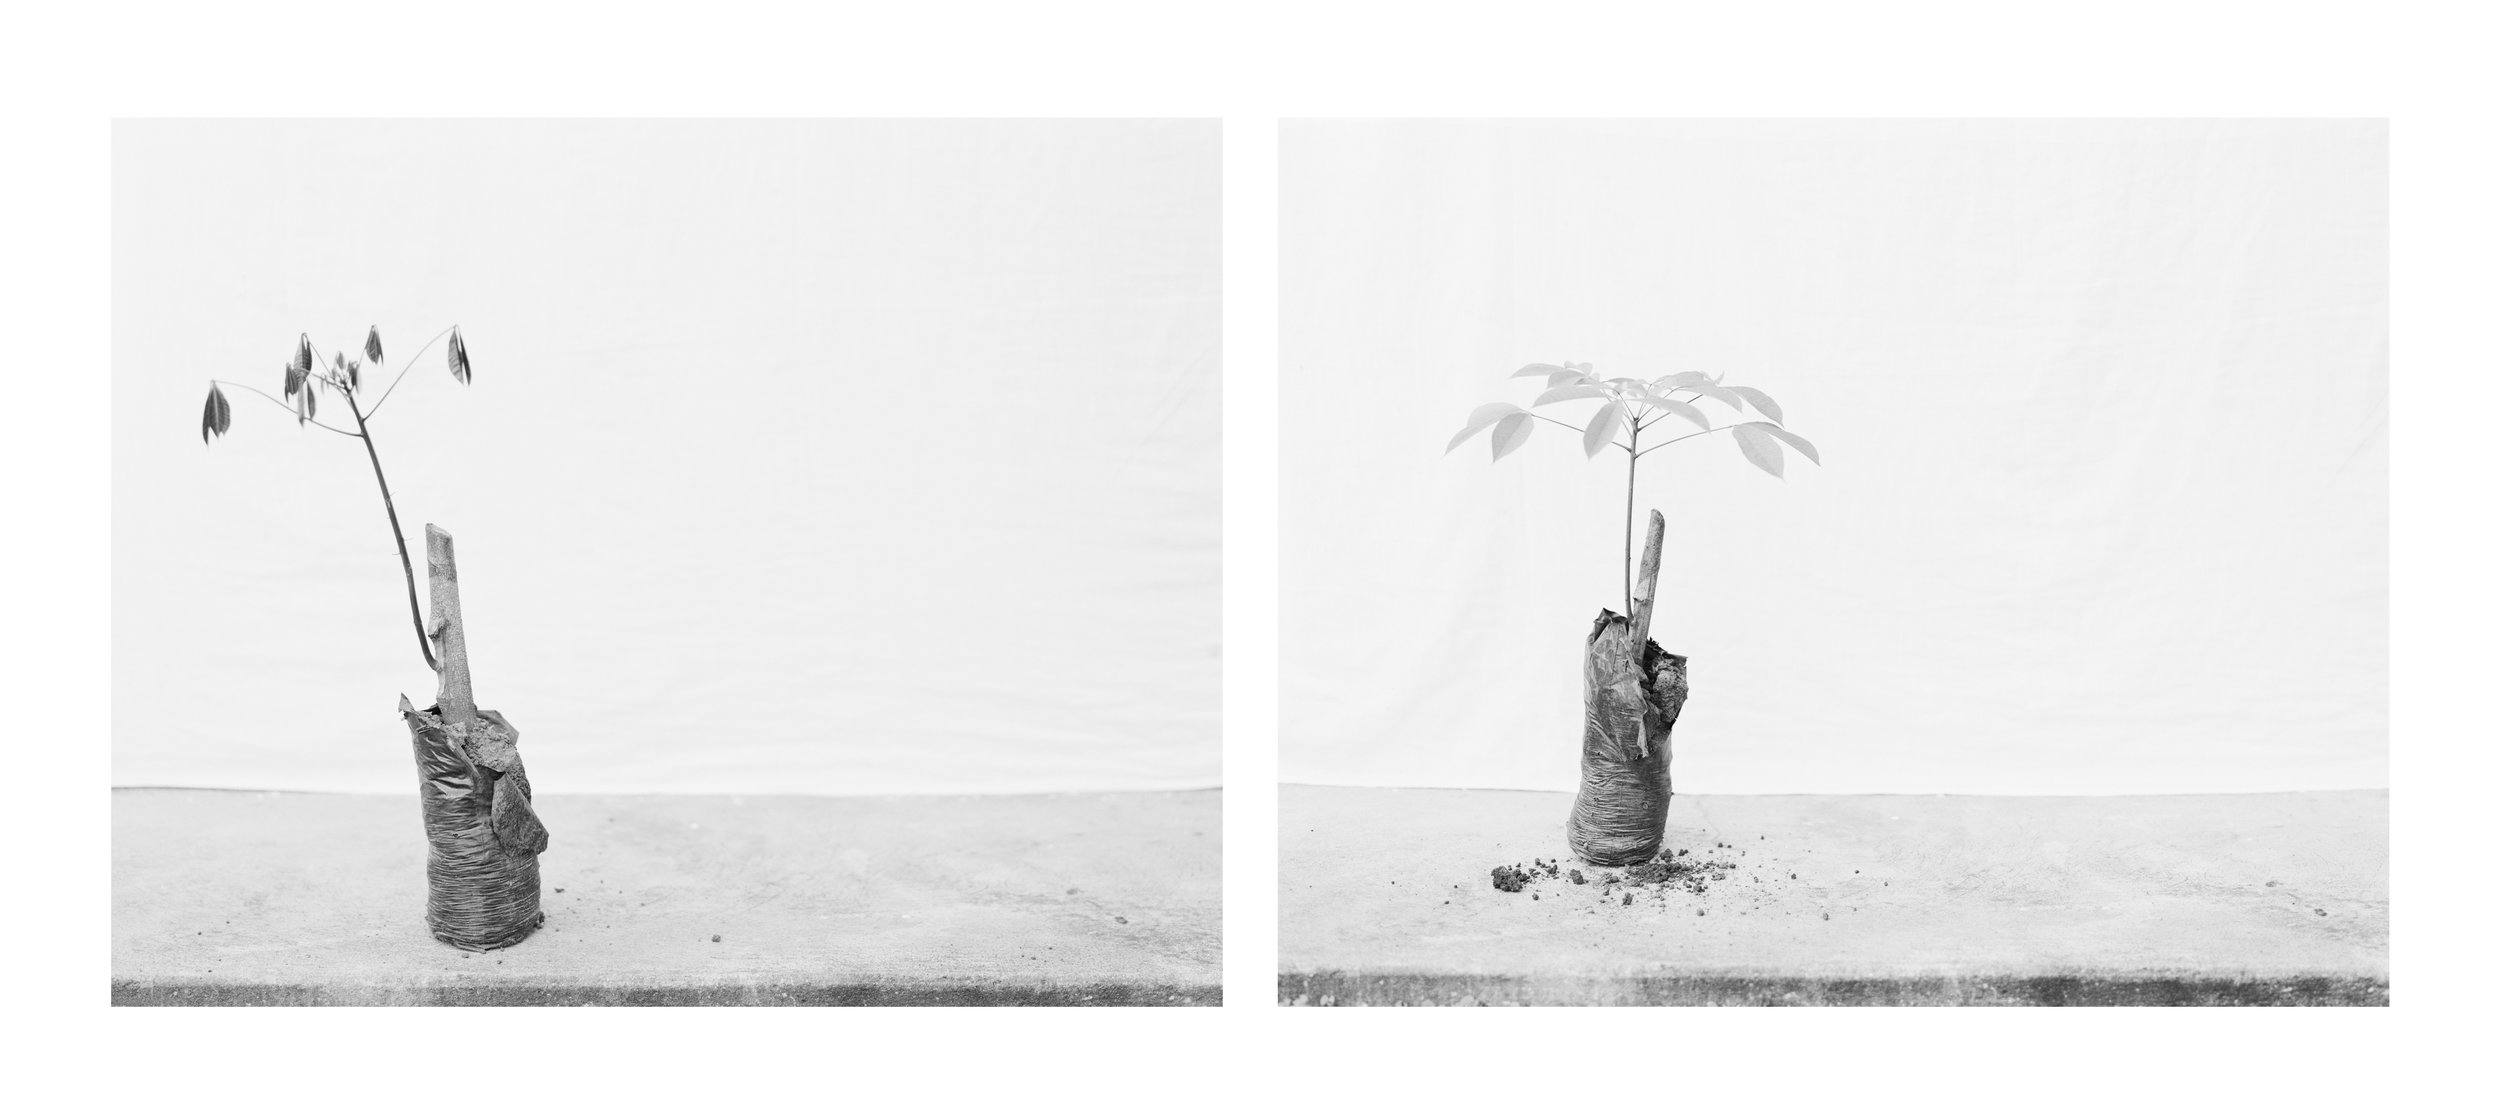 Hevea brasiliensis , rubber tree graft in plastic bag No. 1 & No. 2, April, 2014, Michelin Rubber Plantation, Bahia, Brazil. 2014/2018